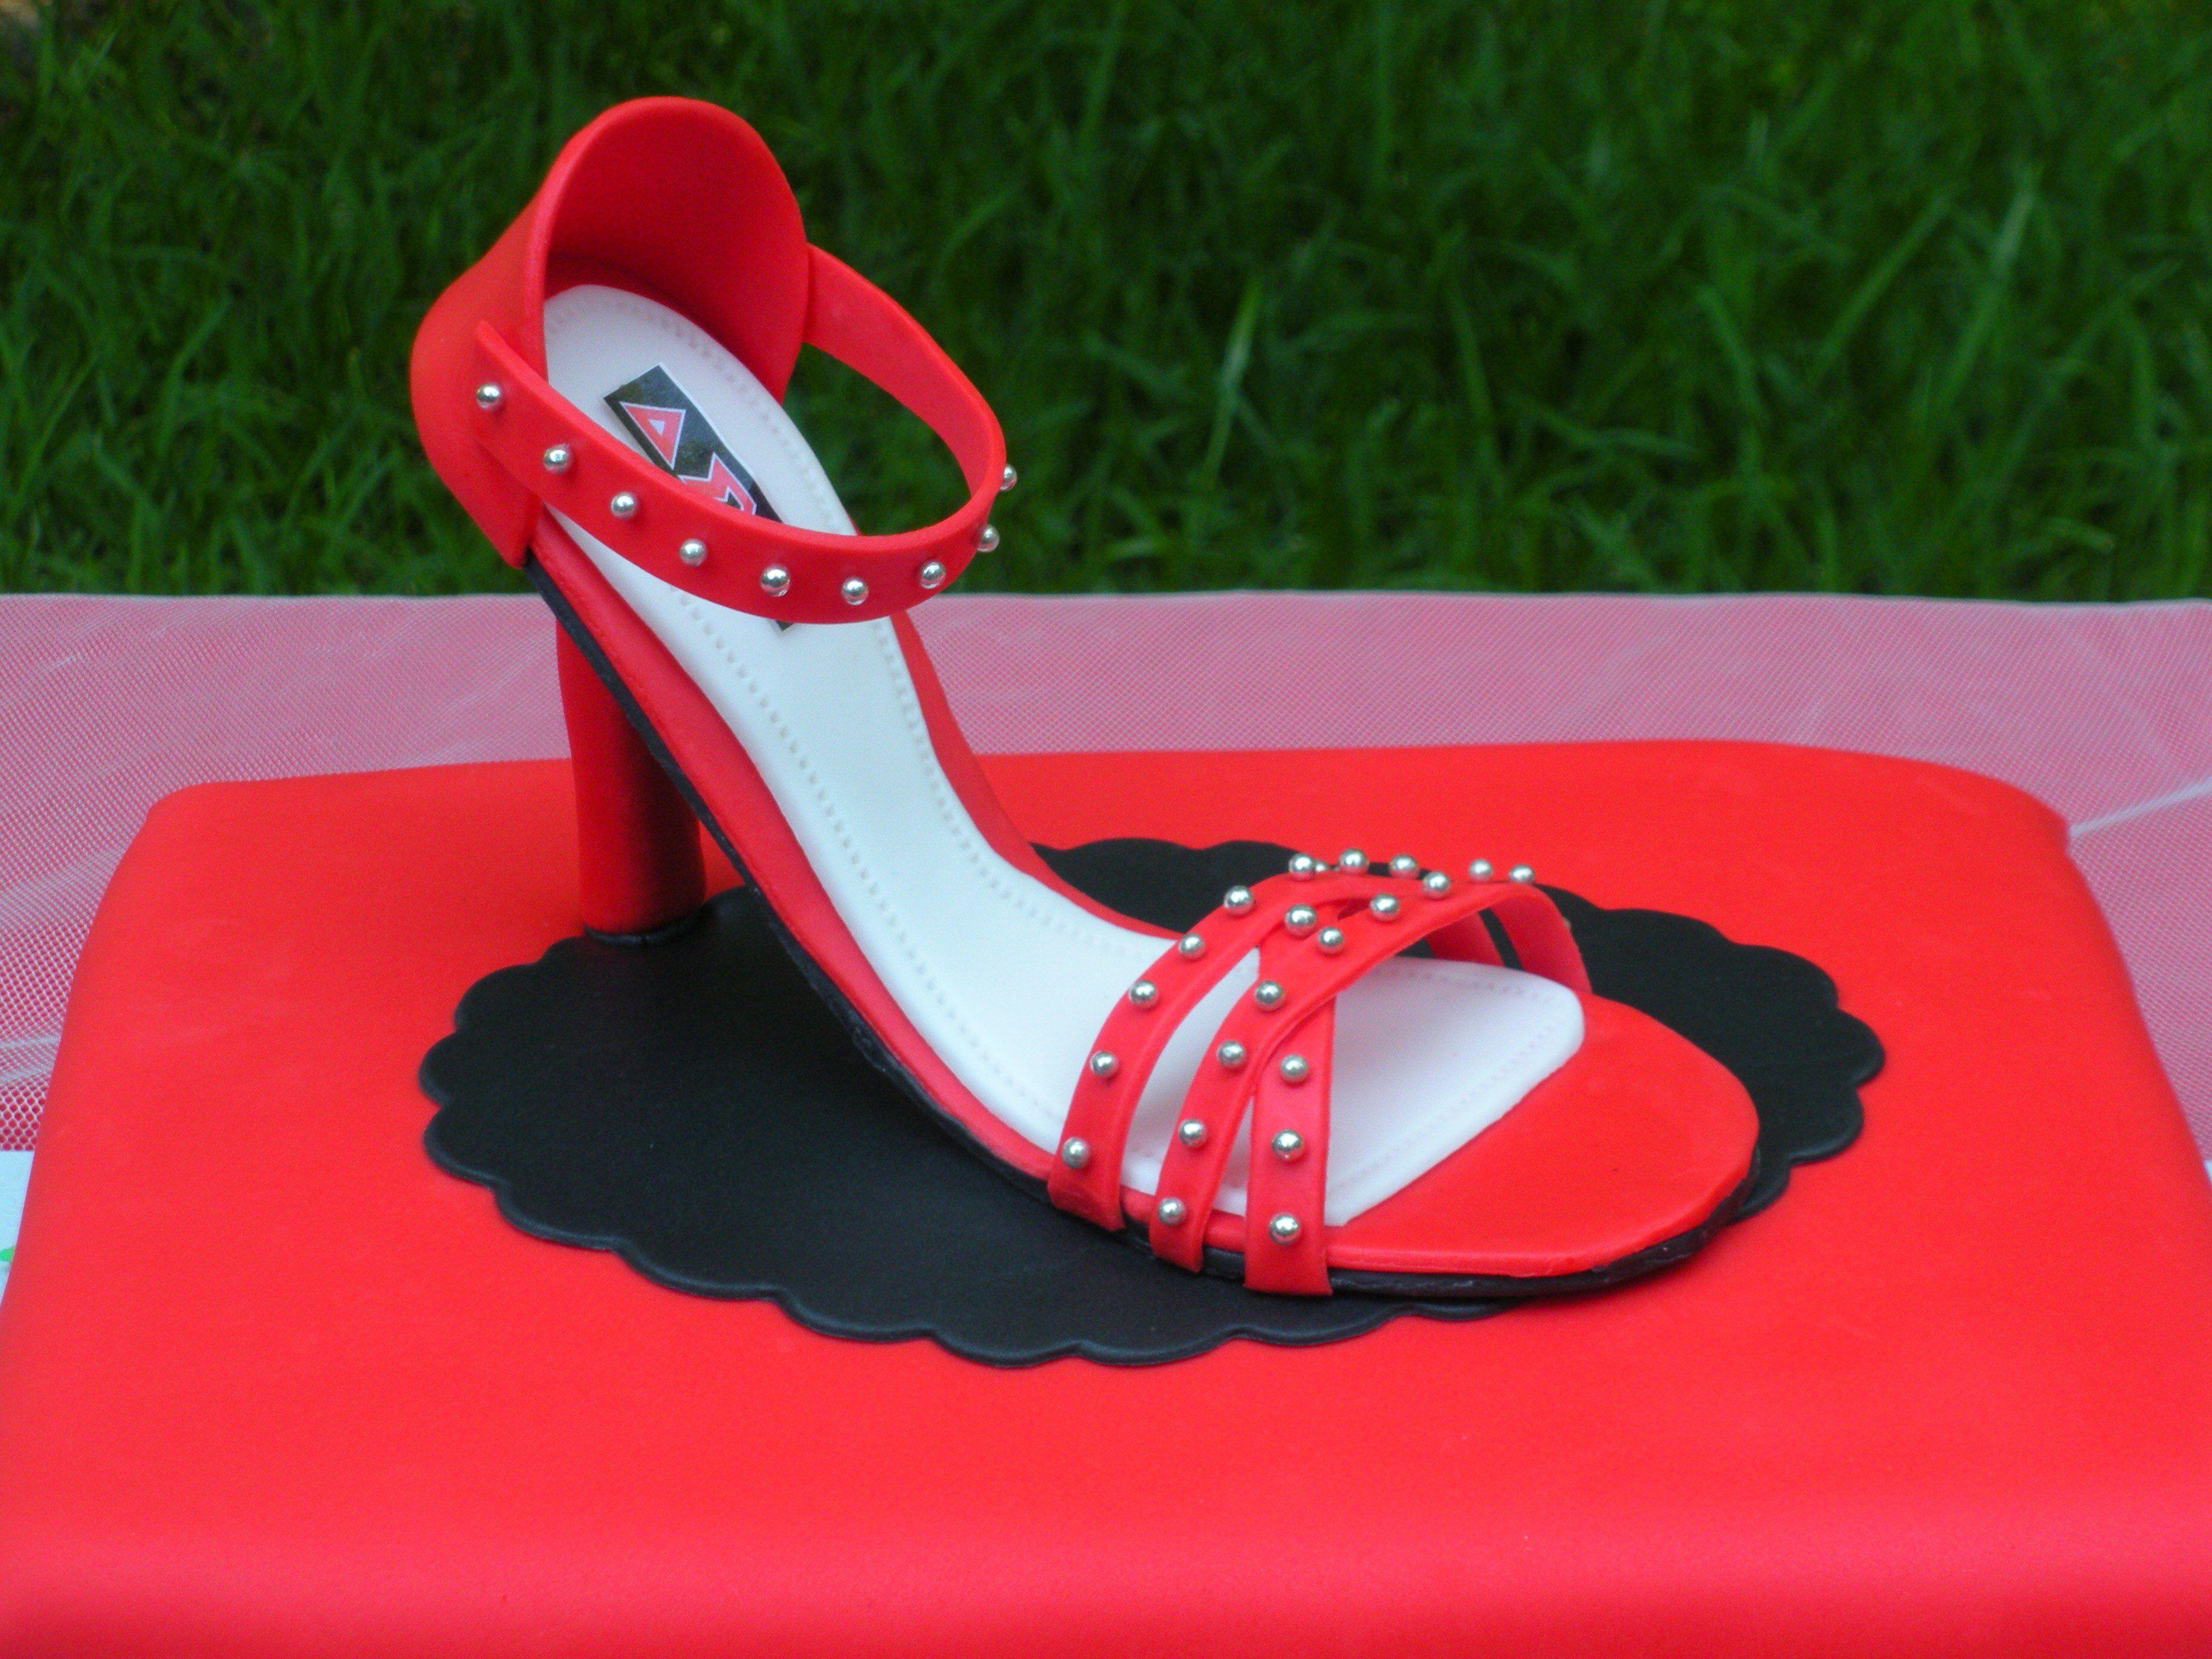 Geechigirl's High Shoe Heel TemplateBacken Heel Shoe Geechigirl's High wPkOn80